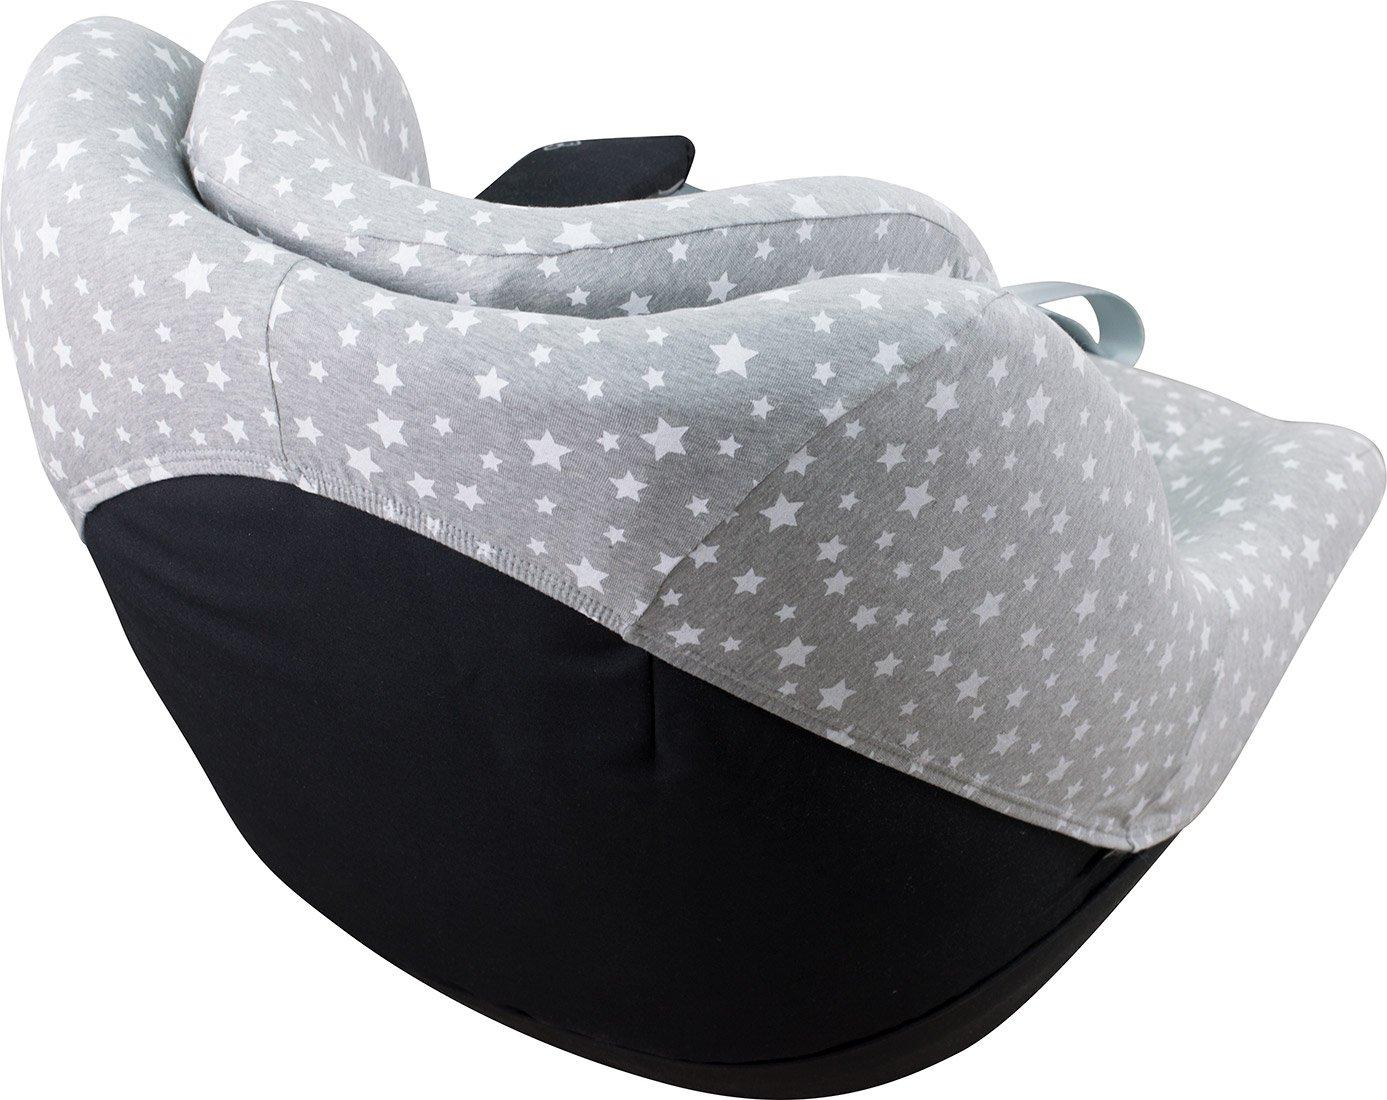 JANABEBE Bezug f/ür Maxicosi 2 way Pearl mit 3D-Verst/ärkung Center-Kanal Black Rayo